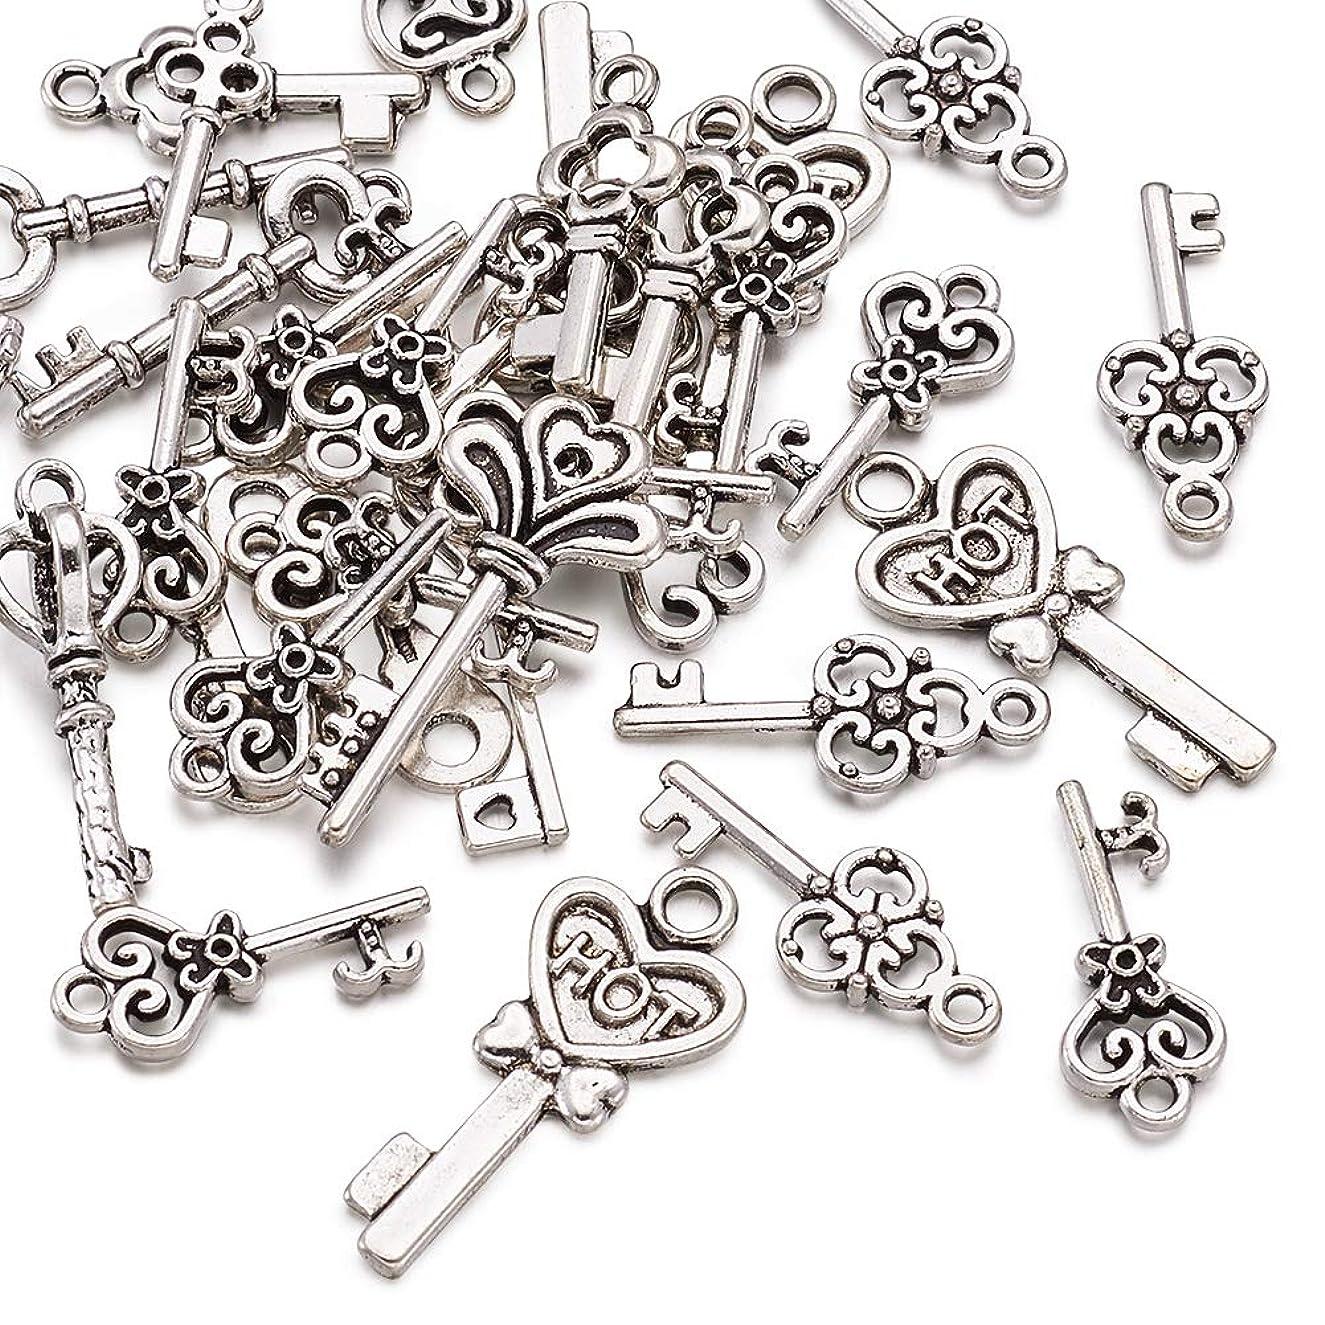 Beadthoven 50pcs Tibetan Style Key Pendants Skeleton Keys Bulk Vintage Antique Look Replica Charms for Jewelry Accessories Making Bracelets Necklaces(Antique Silver)